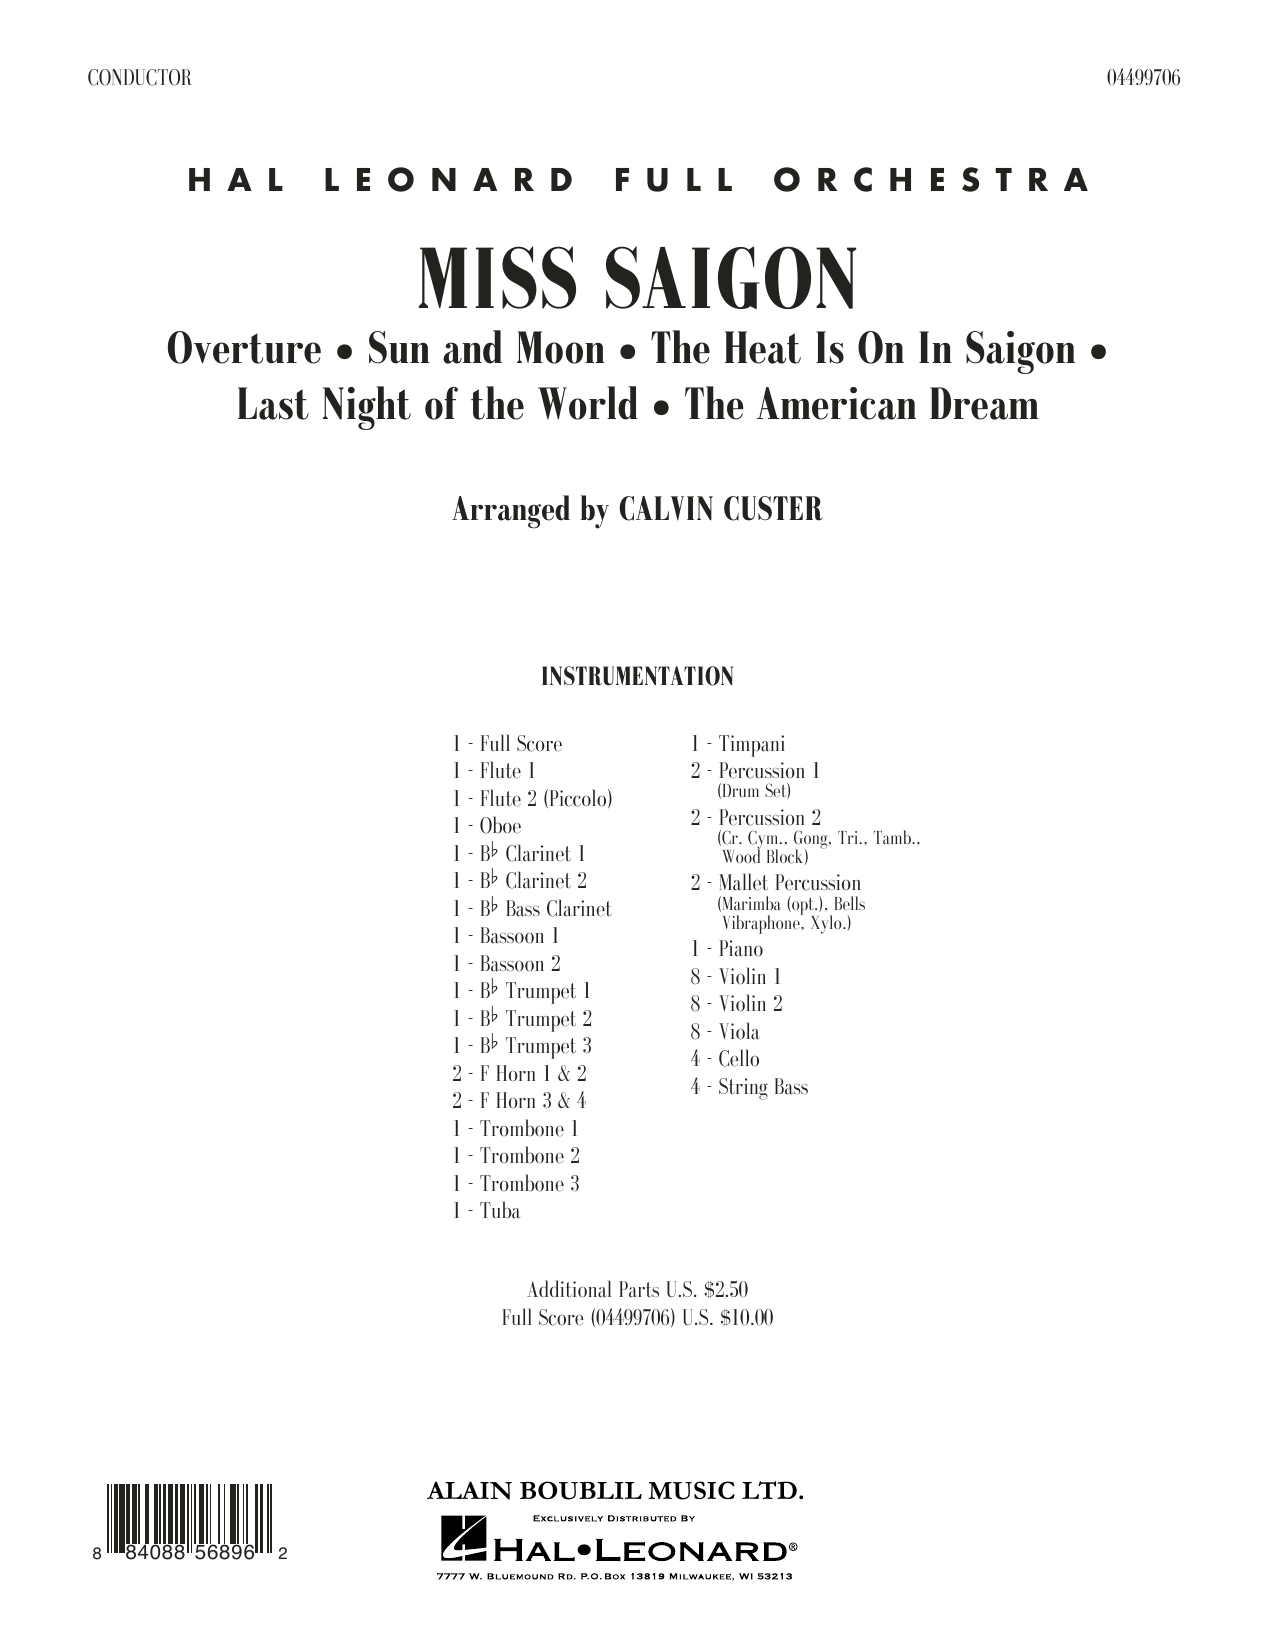 Miss Saigon (arr. Calvin Custer) - Full Score (Full Orchestra)